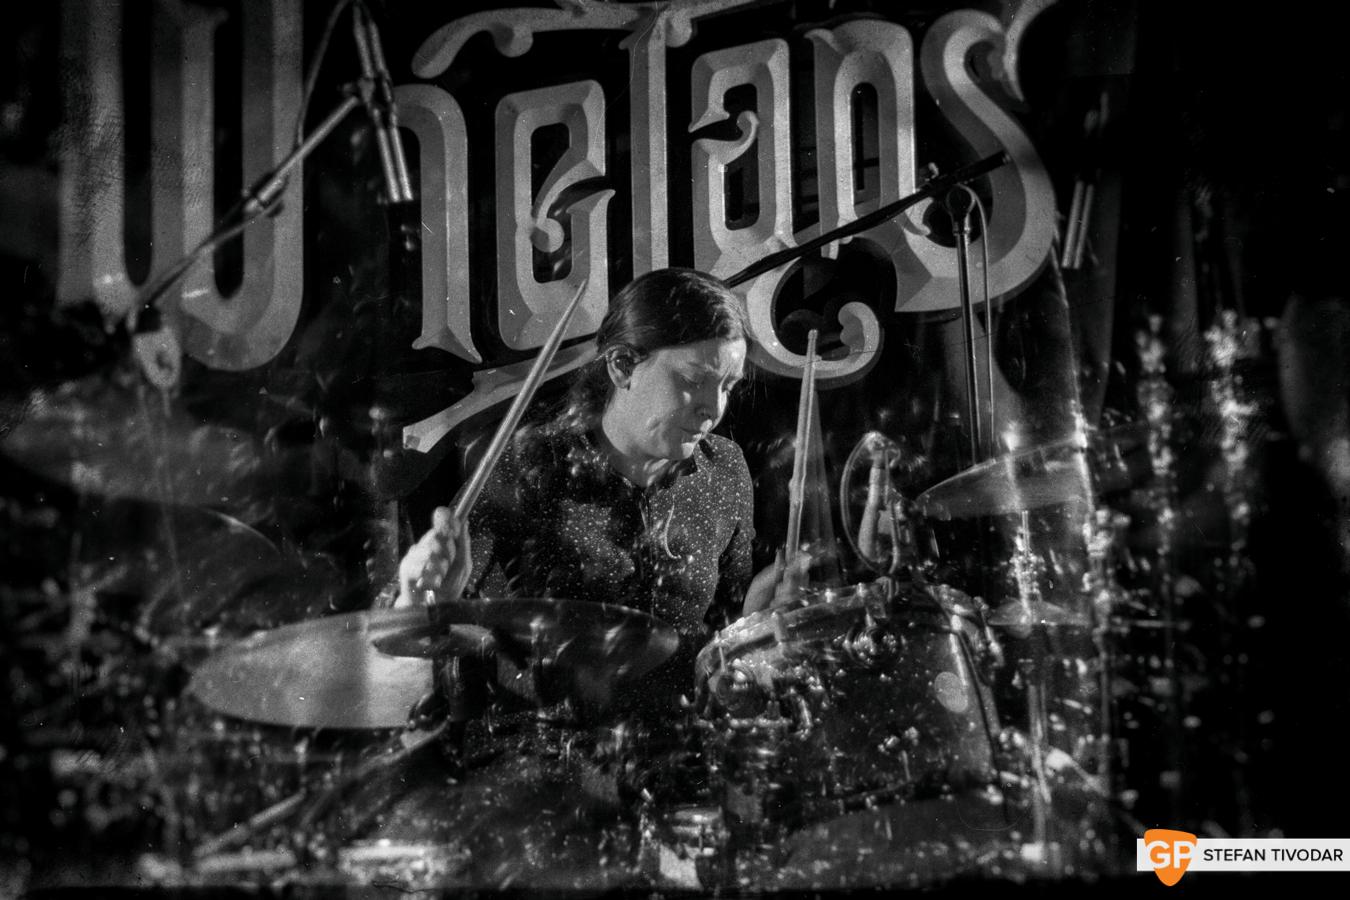 Pixie Cut Rhythm Orchestra Whelan's Ones to Watch 17 January 2020 Dublin Tivodar 3